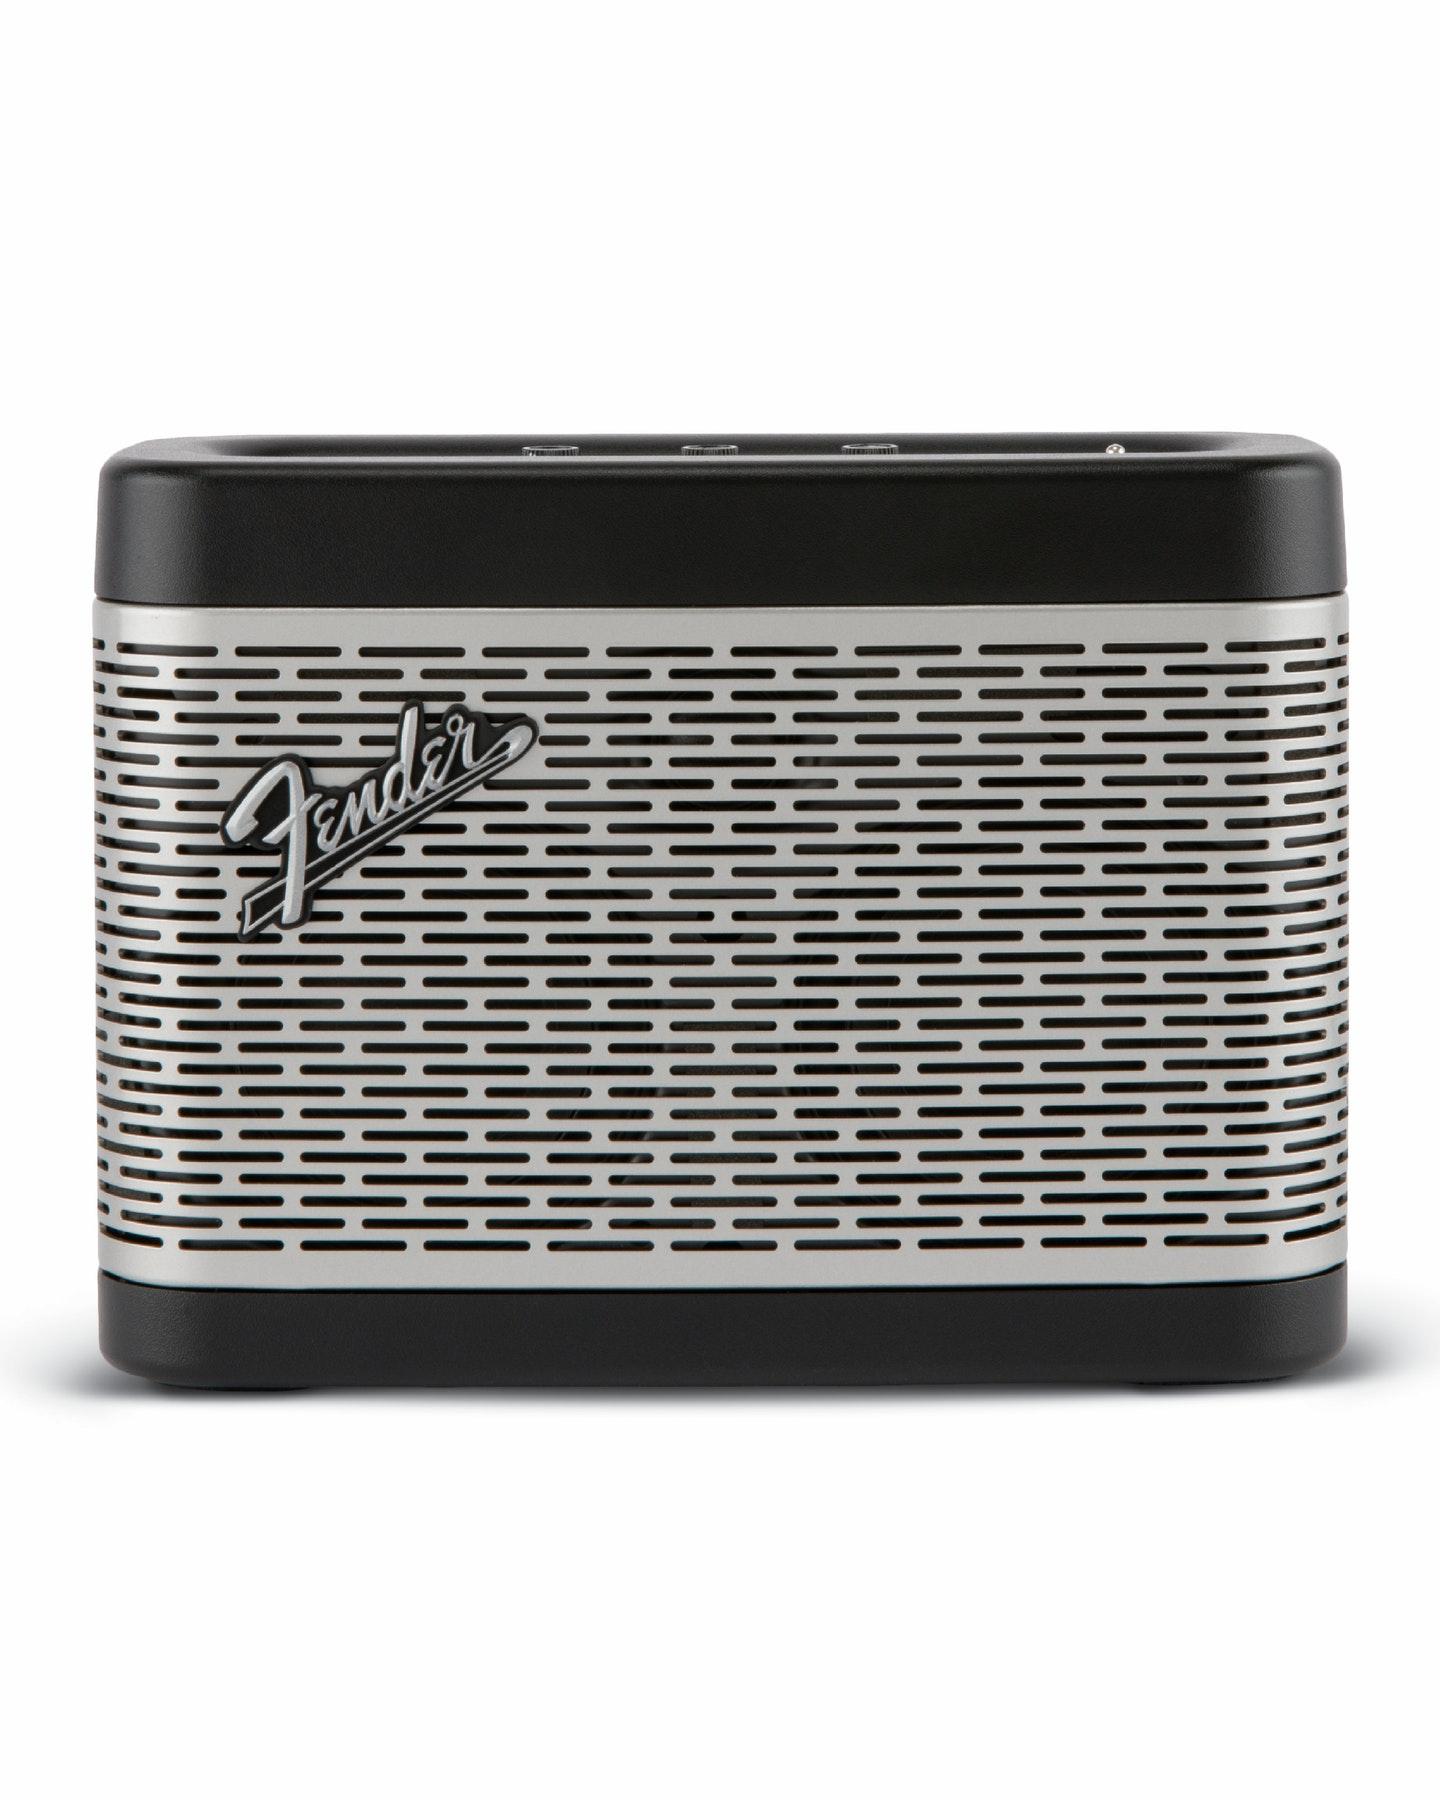 Fender Newport Bluetooth Speaker Black Silver